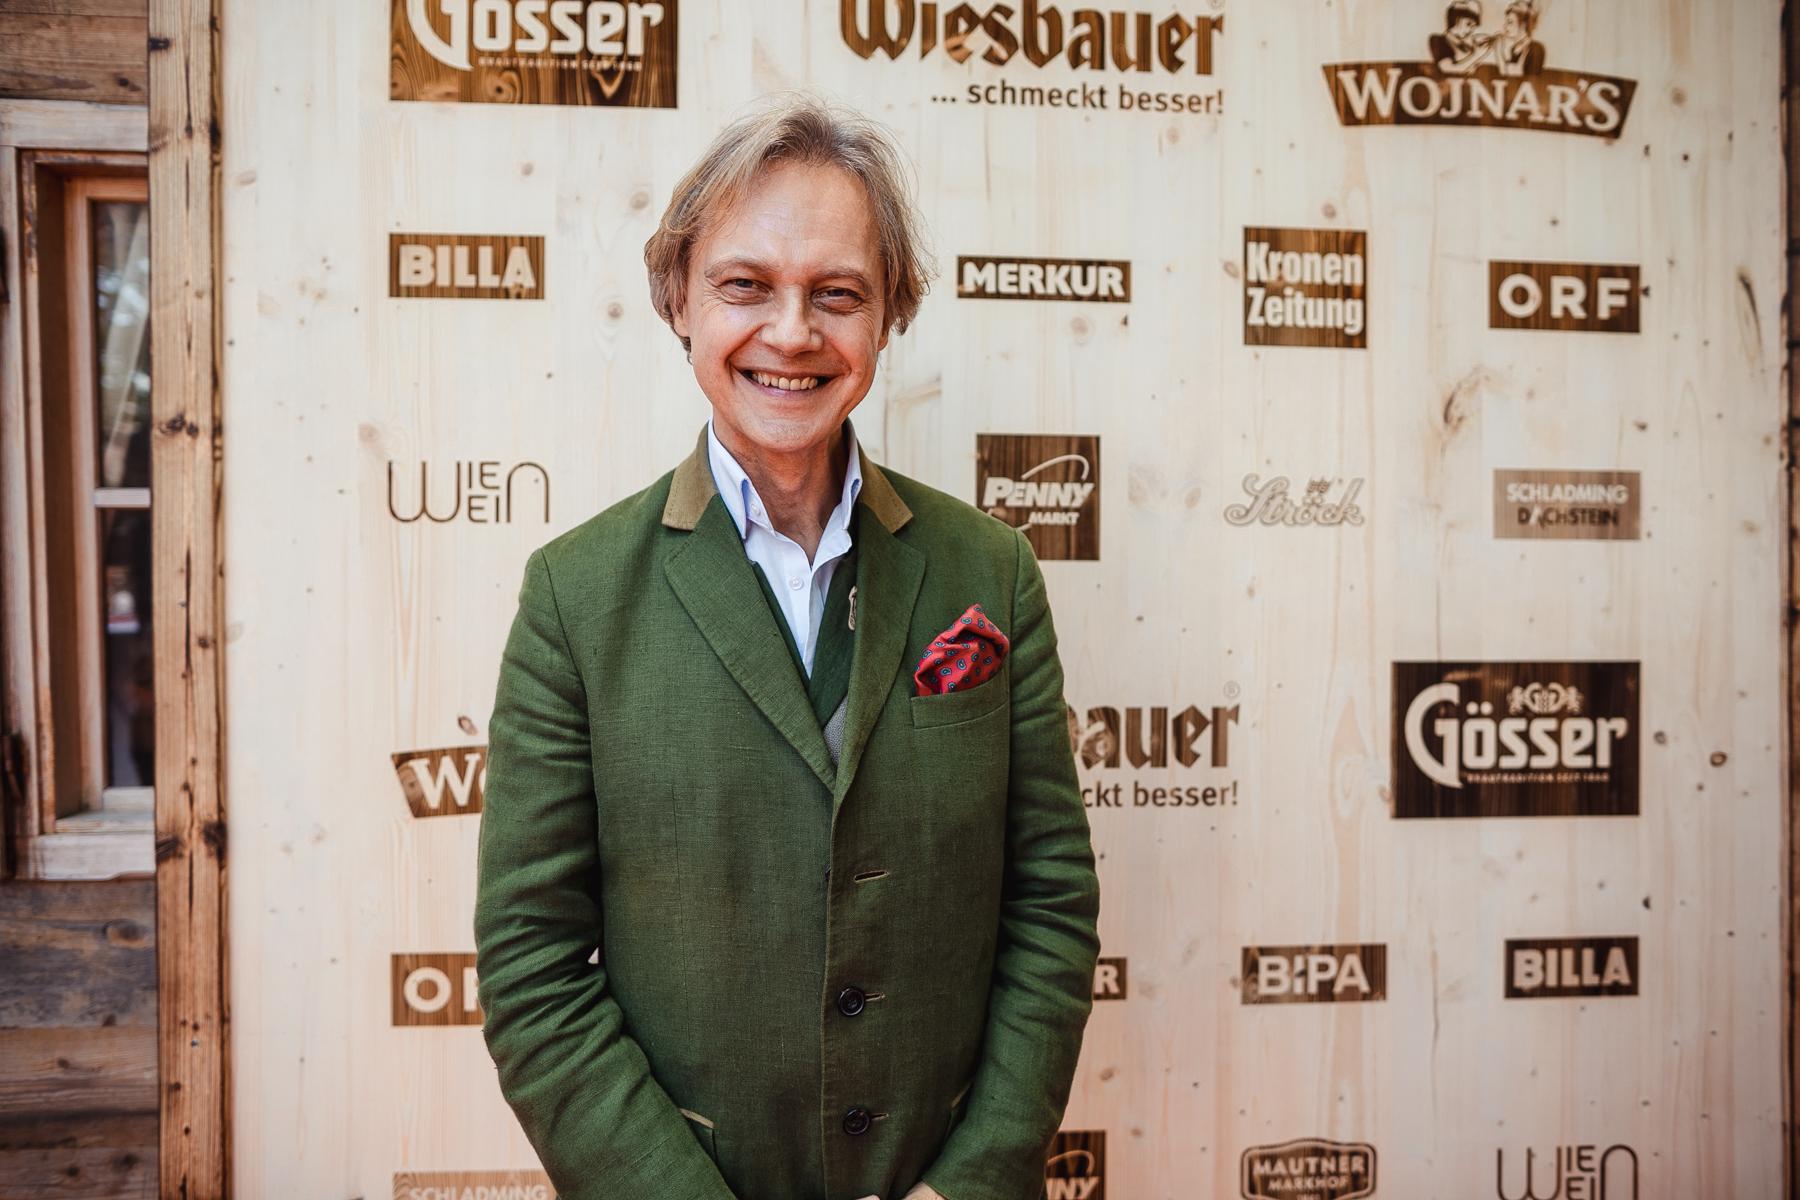 Christian Feldhofer Wiener Wiesn David Pan 21. September 2021